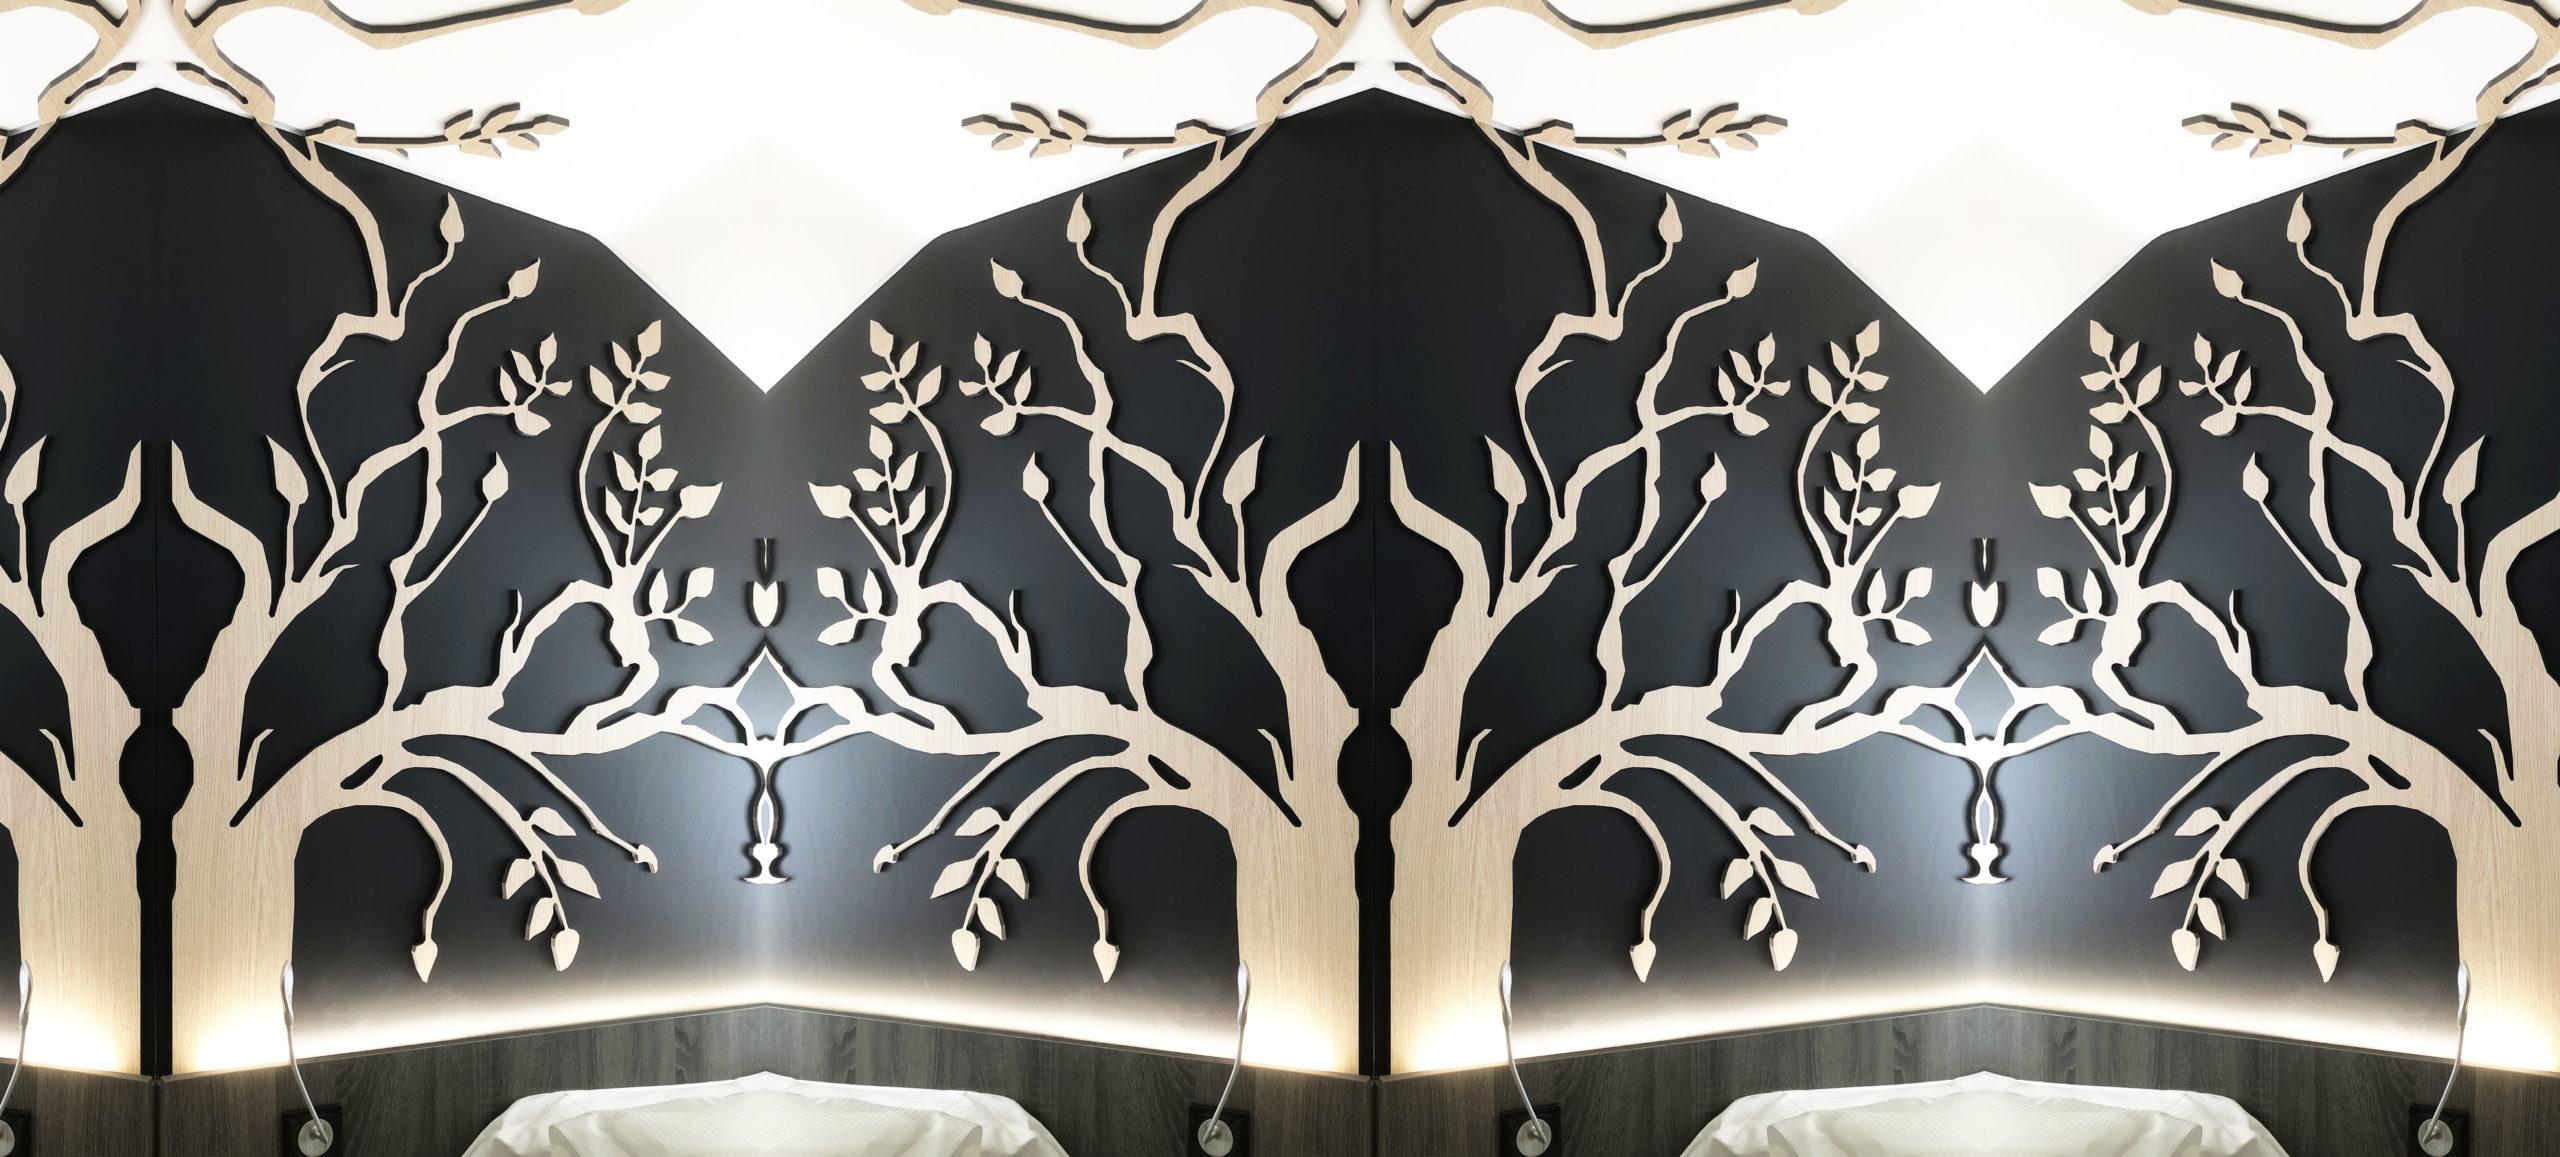 HÔTELLERIE/QUALITY HOTEL